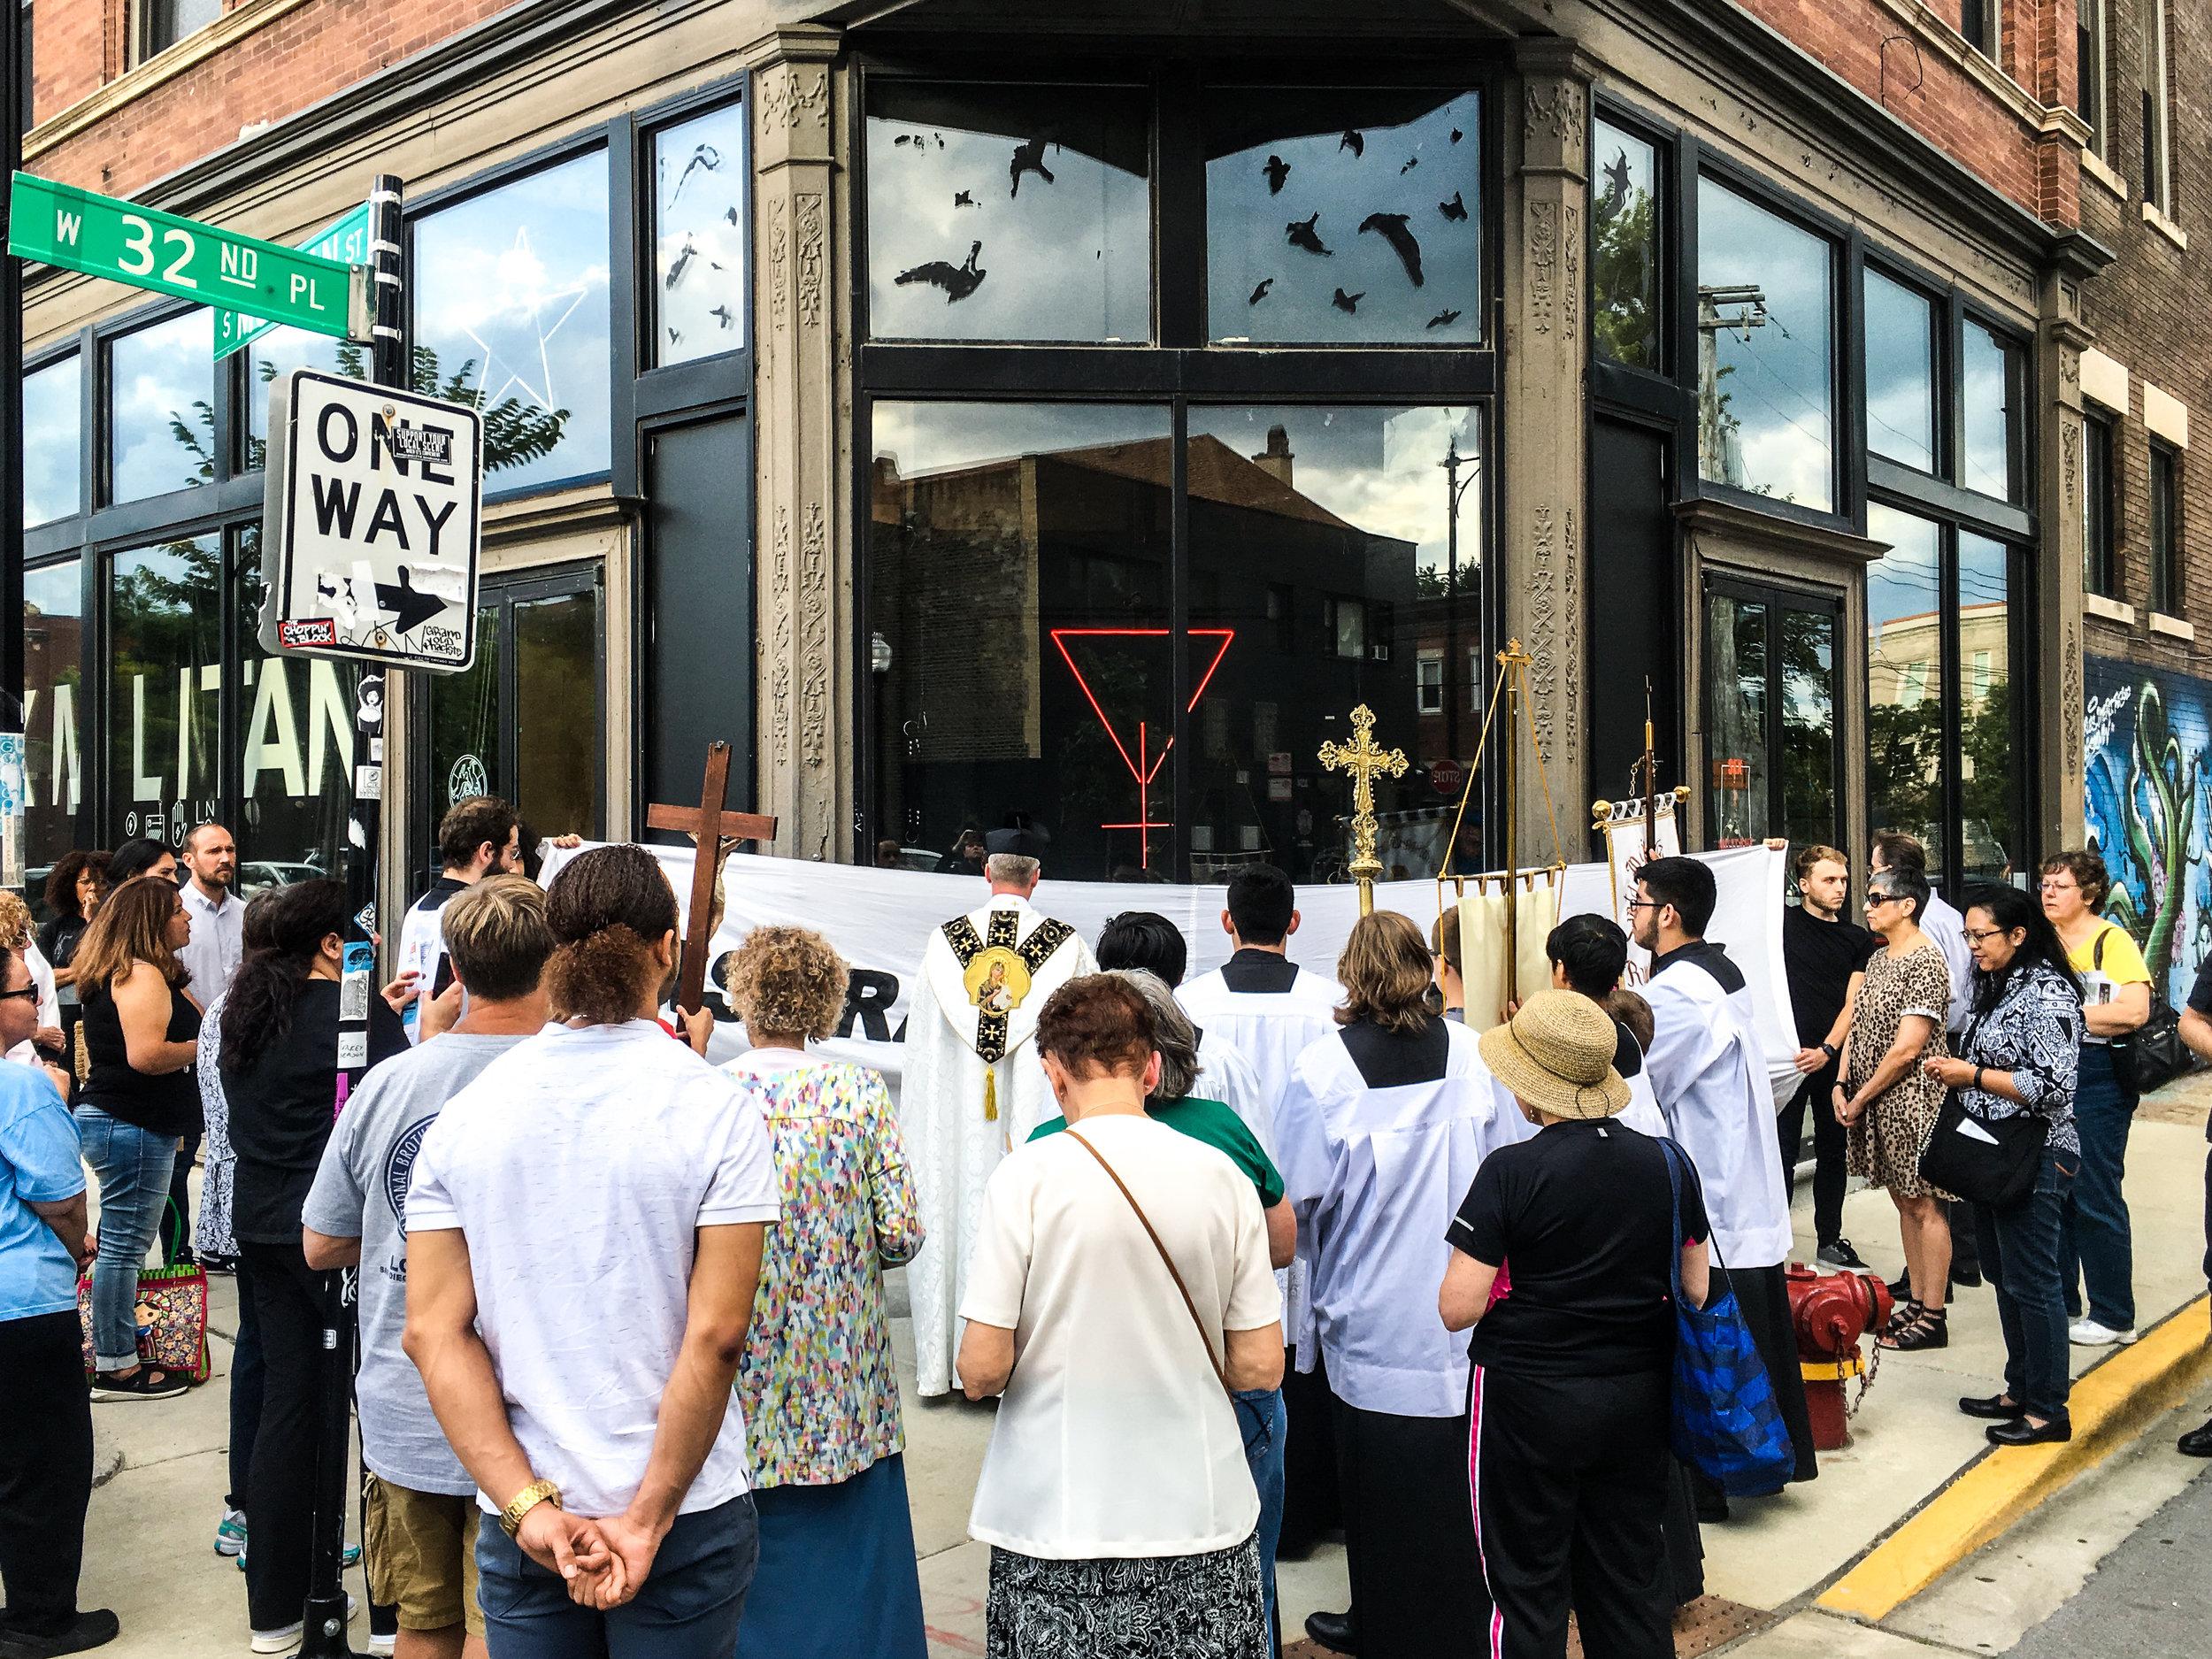 Catholic Church, unannounced protest. Photographer Leah Peacock.